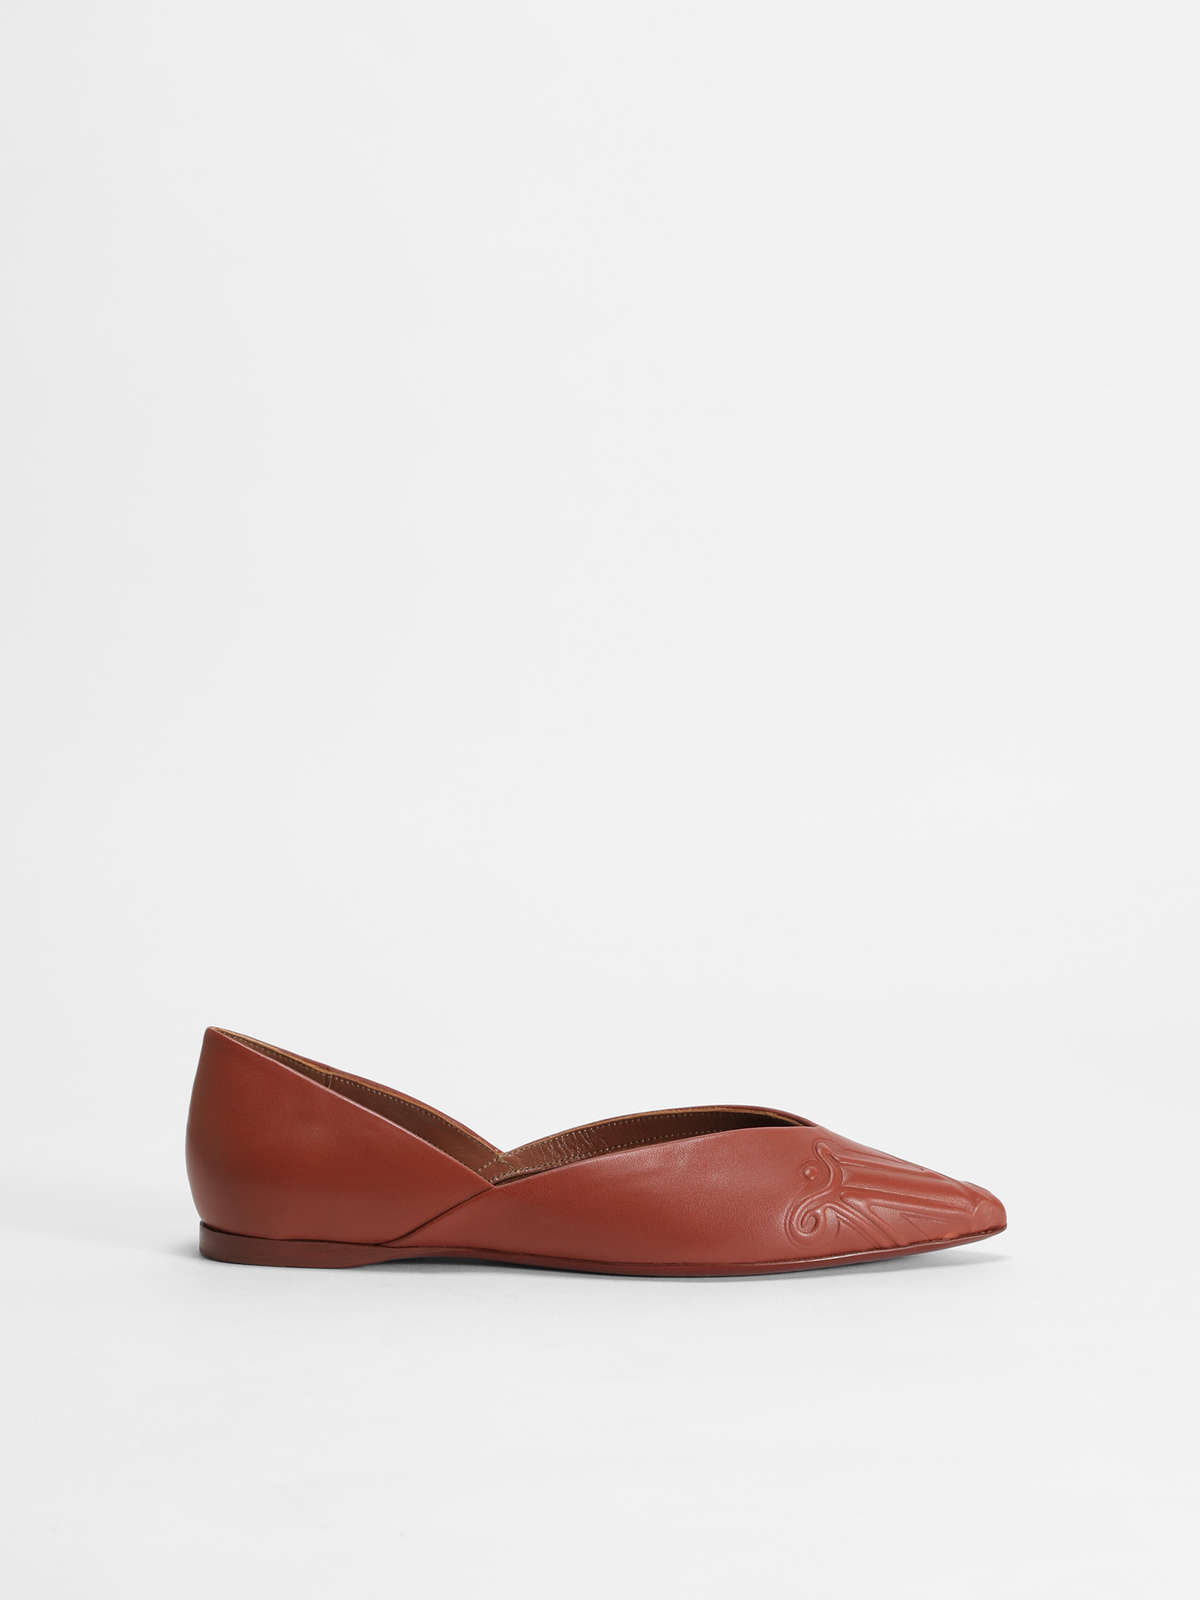 Ballerina in nappa leather - Max Mara